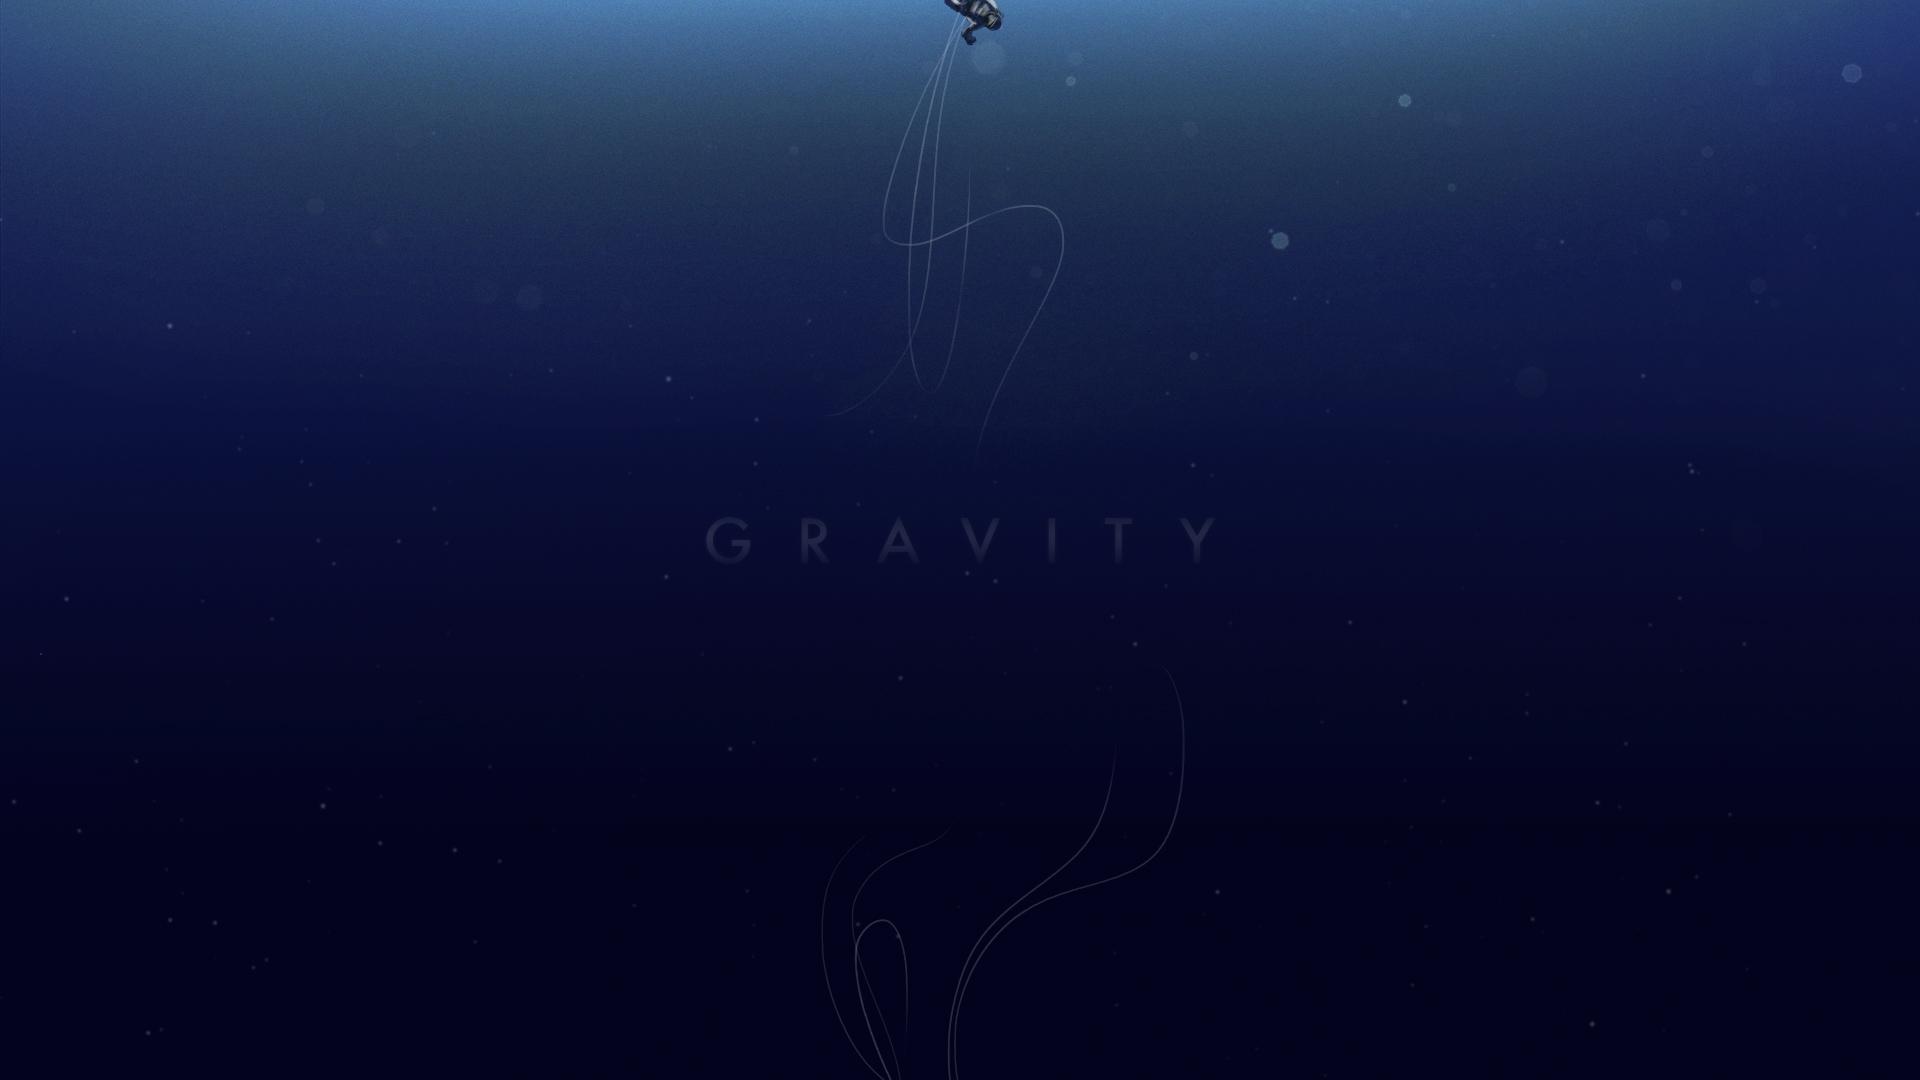 Gravity_frame03.jpeg